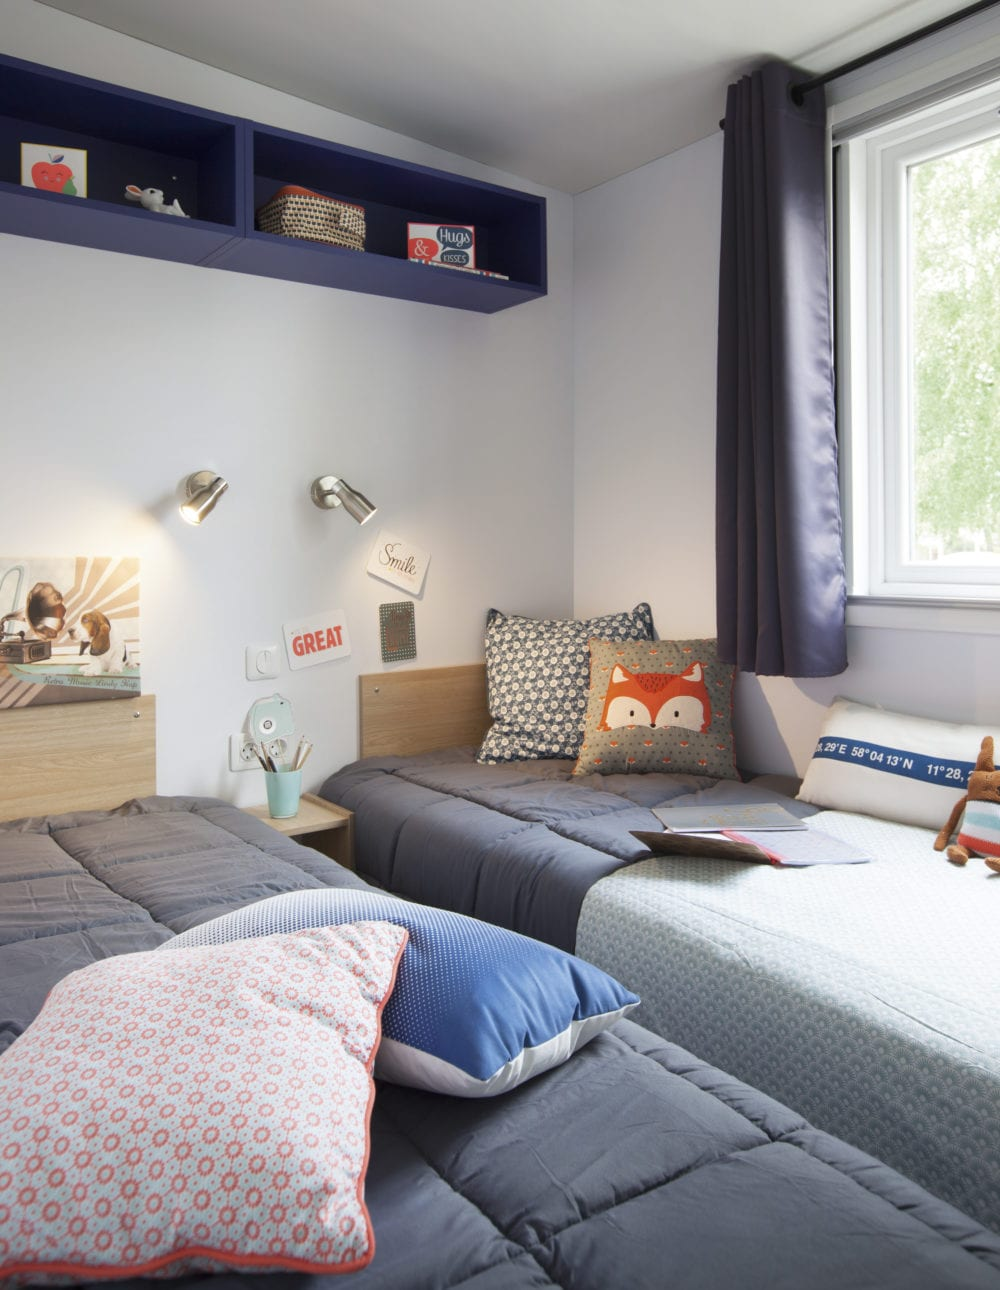 Louisiane Declik 3cio - Mobil home neuf - Declik - 2019 - Zen Mobil homes